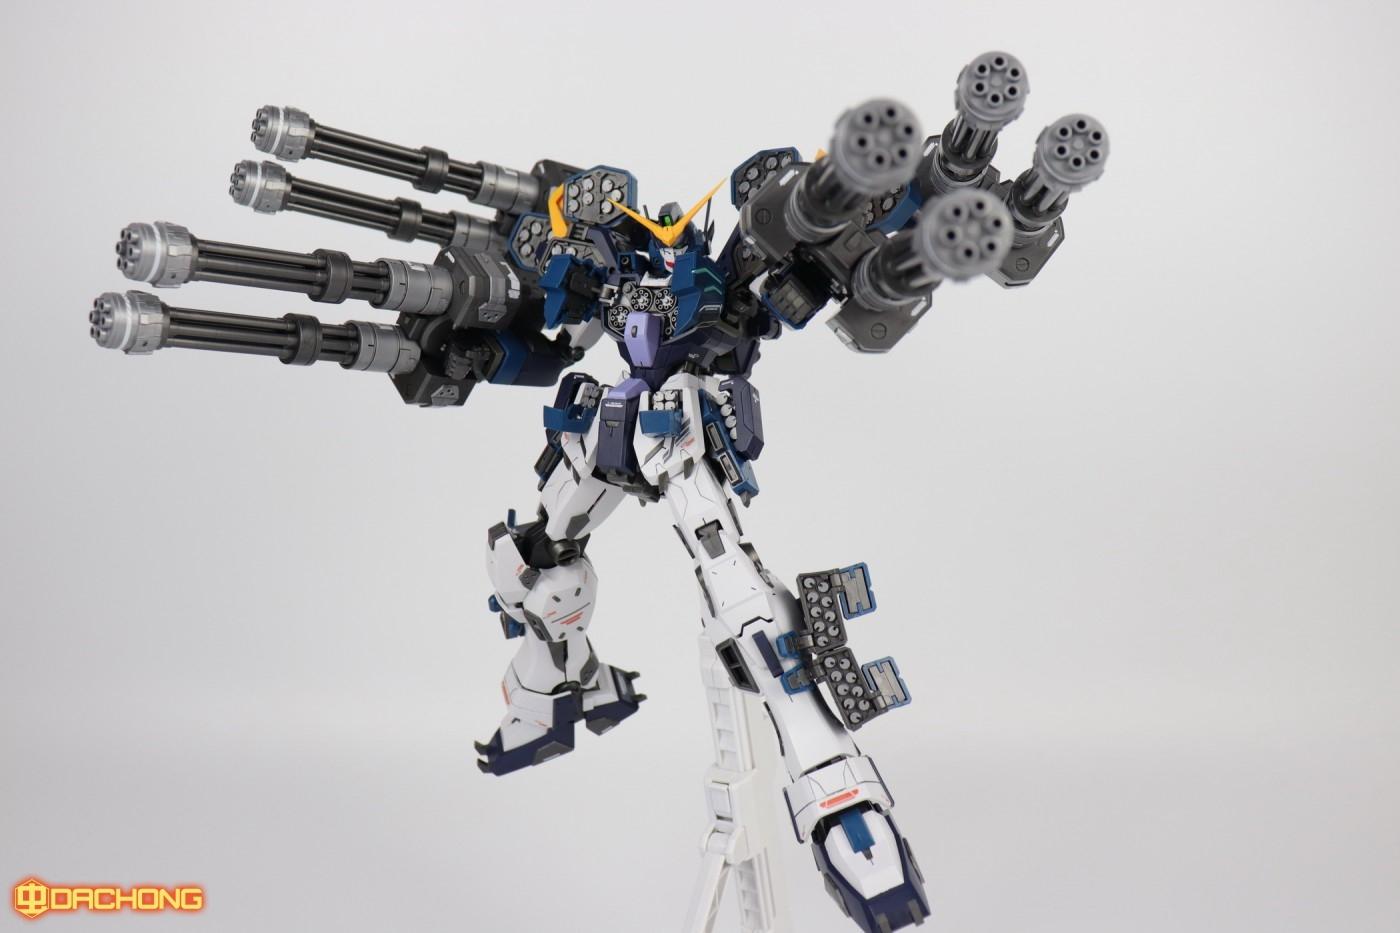 S296_MG_heavy_102.jpg